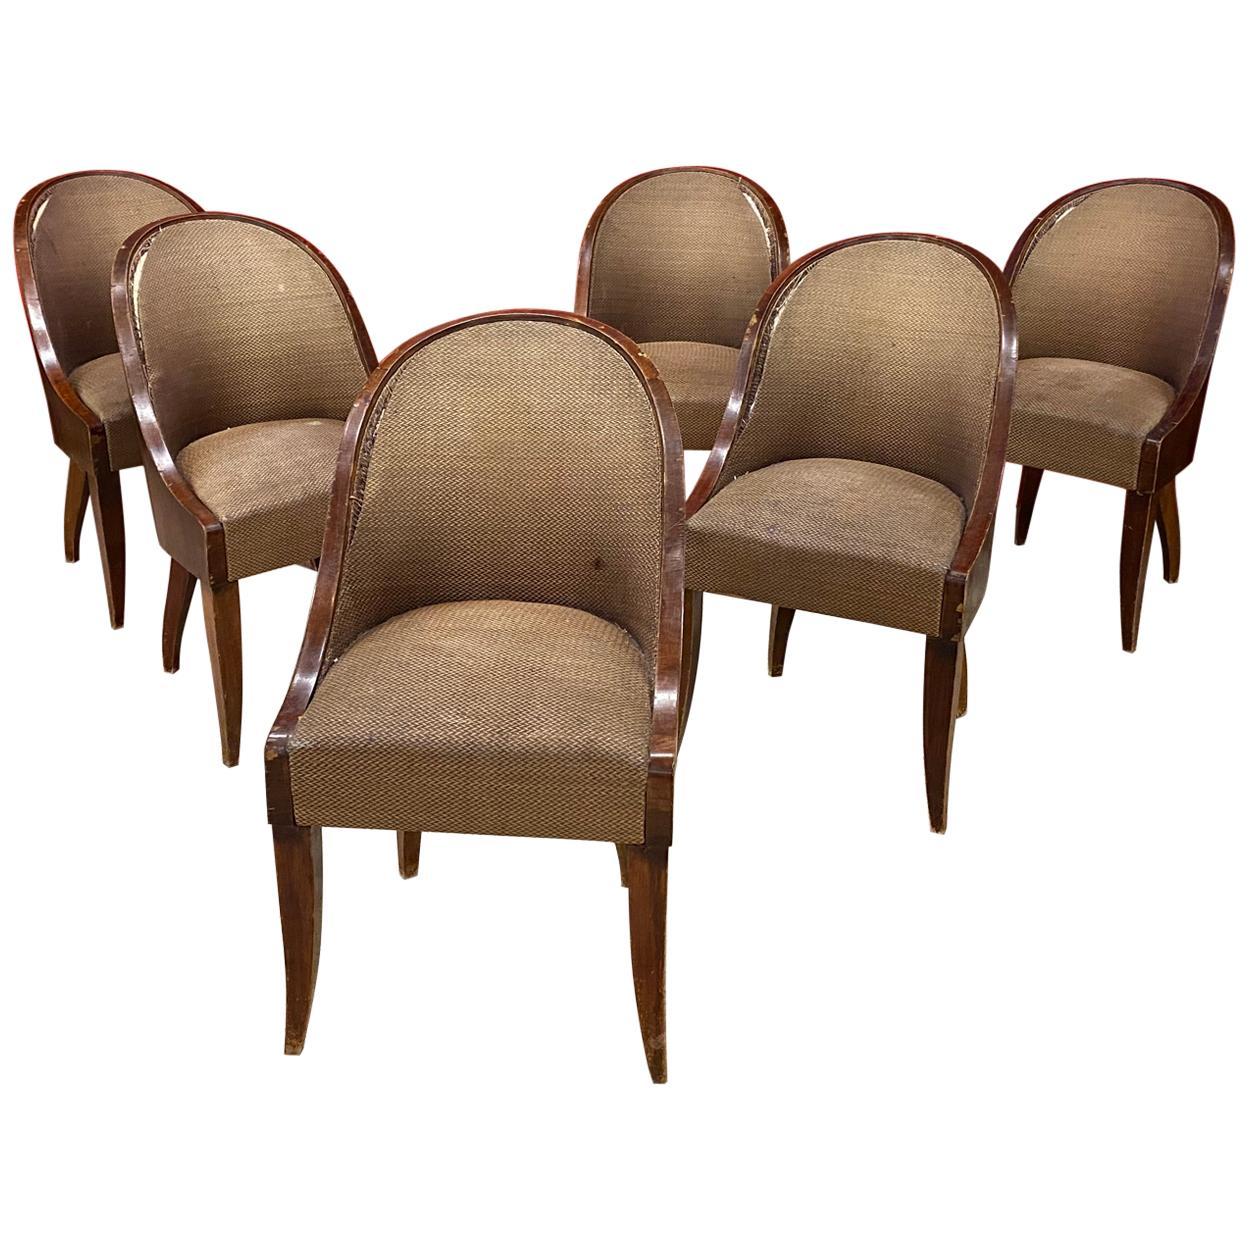 6 Art Deco Chairs, Gondola Back, circa 1930